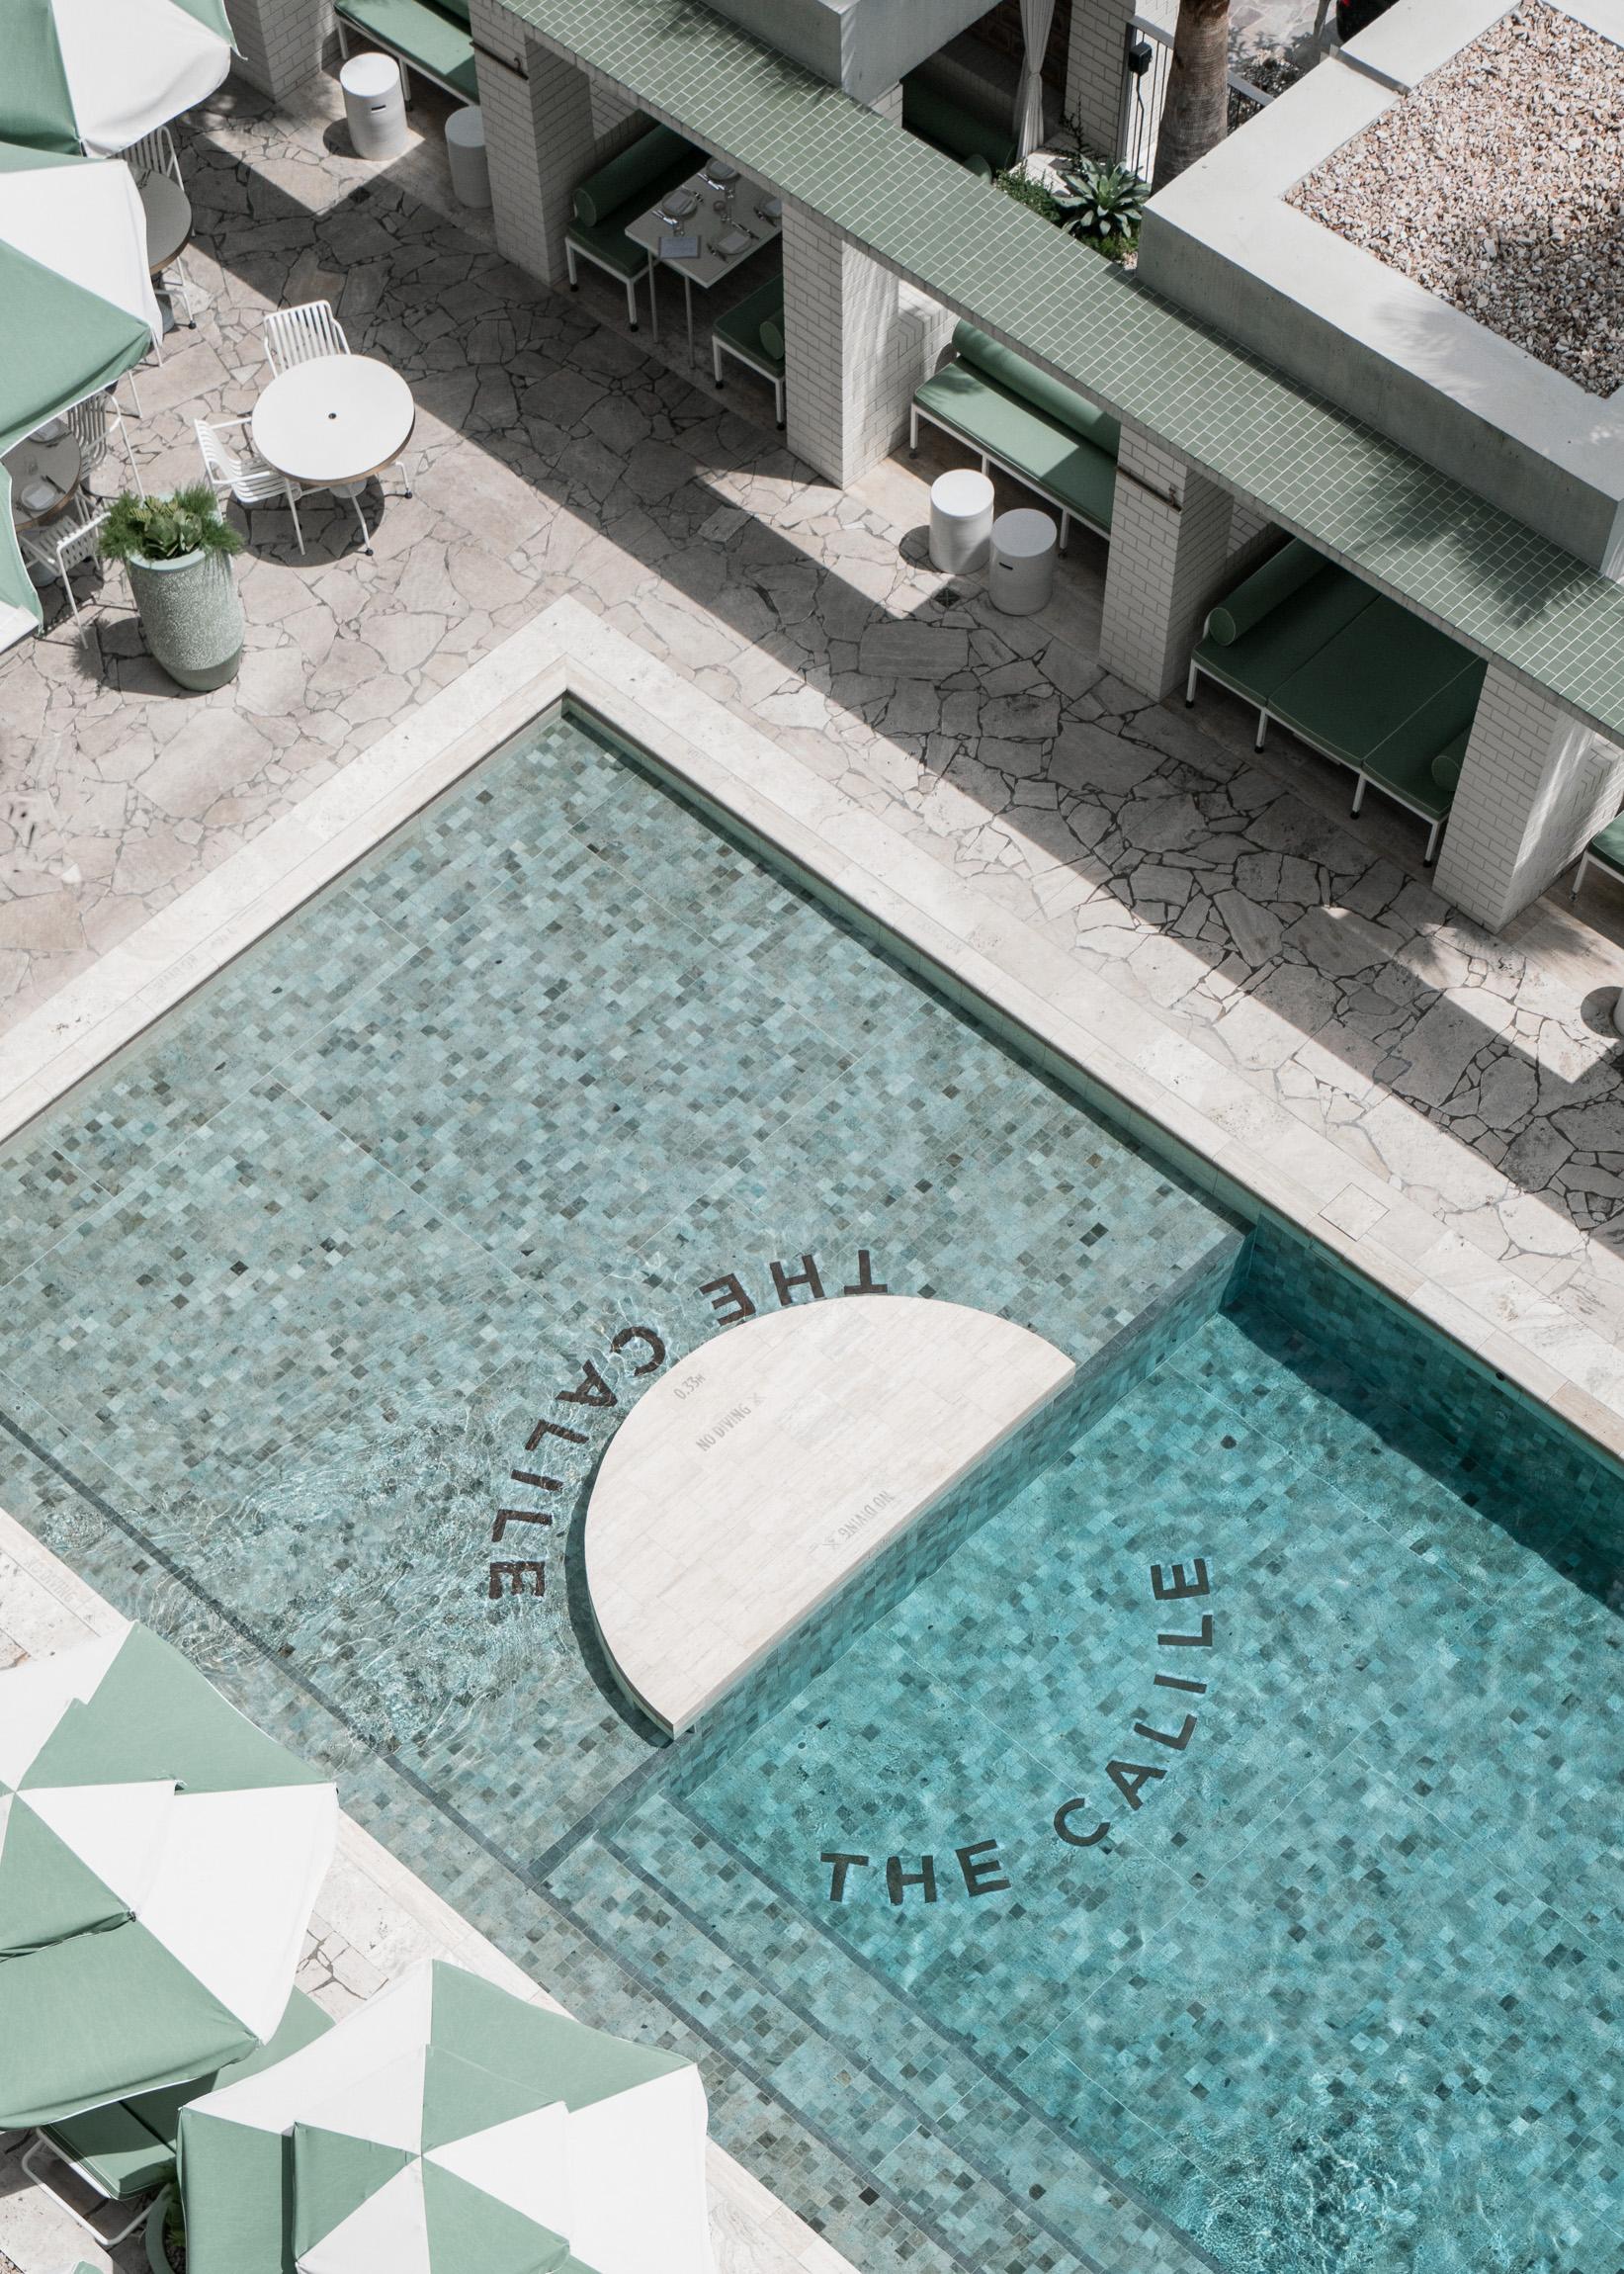 The Calile Hotel - modern design hotel Brisbane